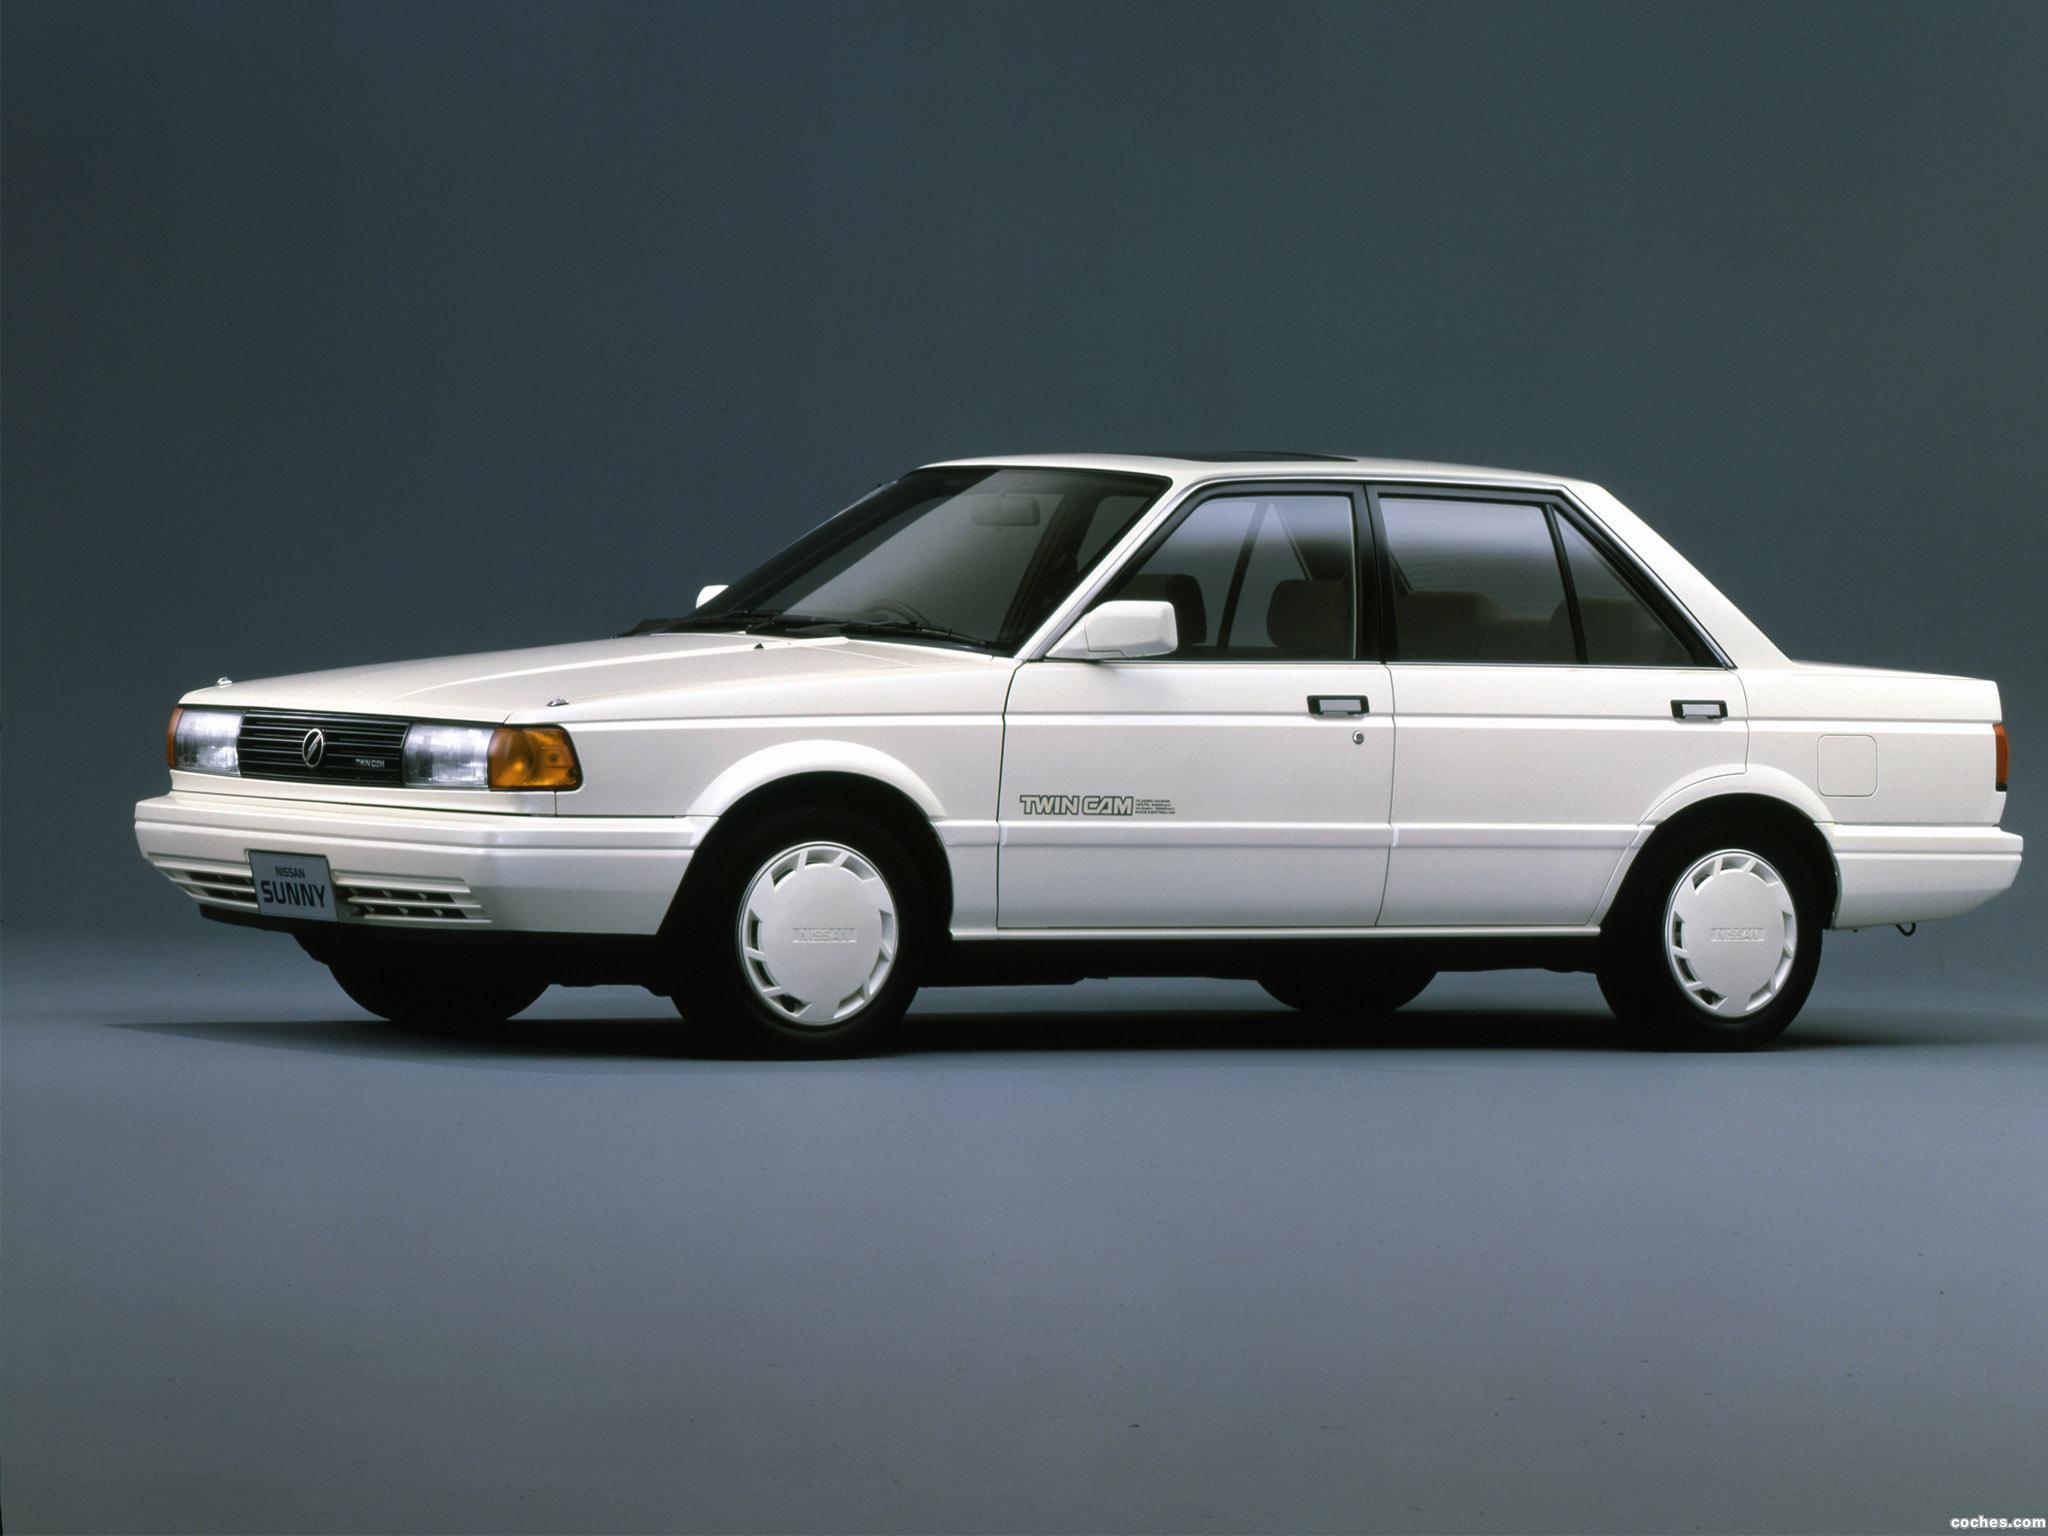 Fotos de Nissan Sunny B12 1987